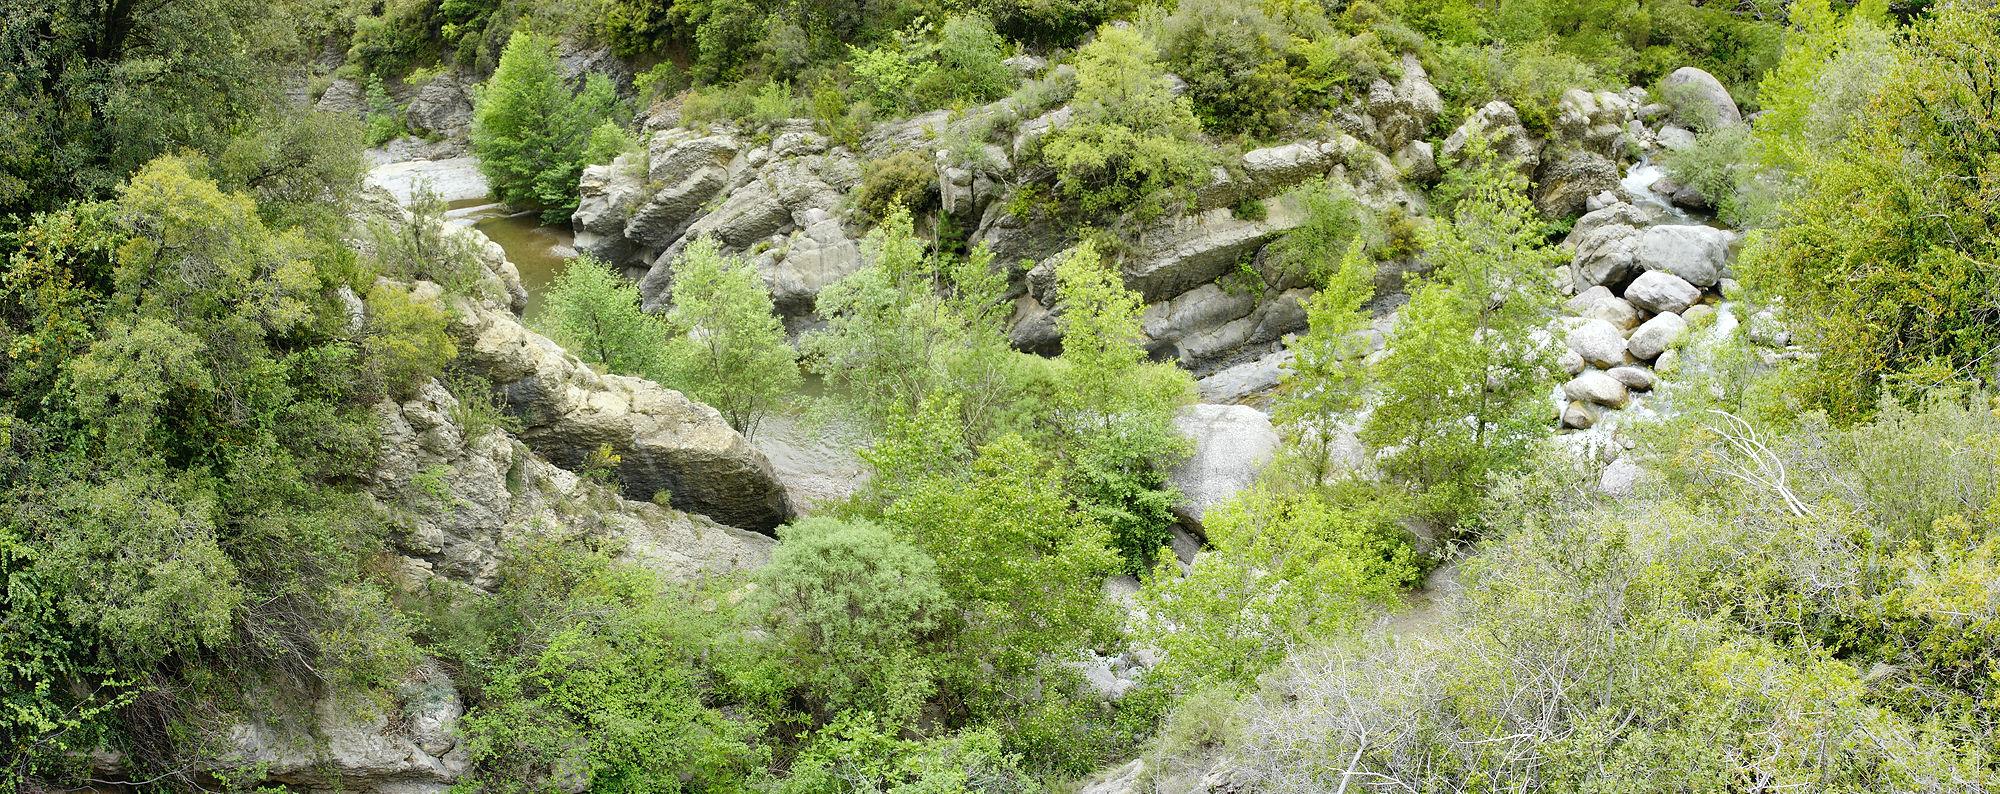 * Blick hinunter zum El Flamsell unter der Felswand *